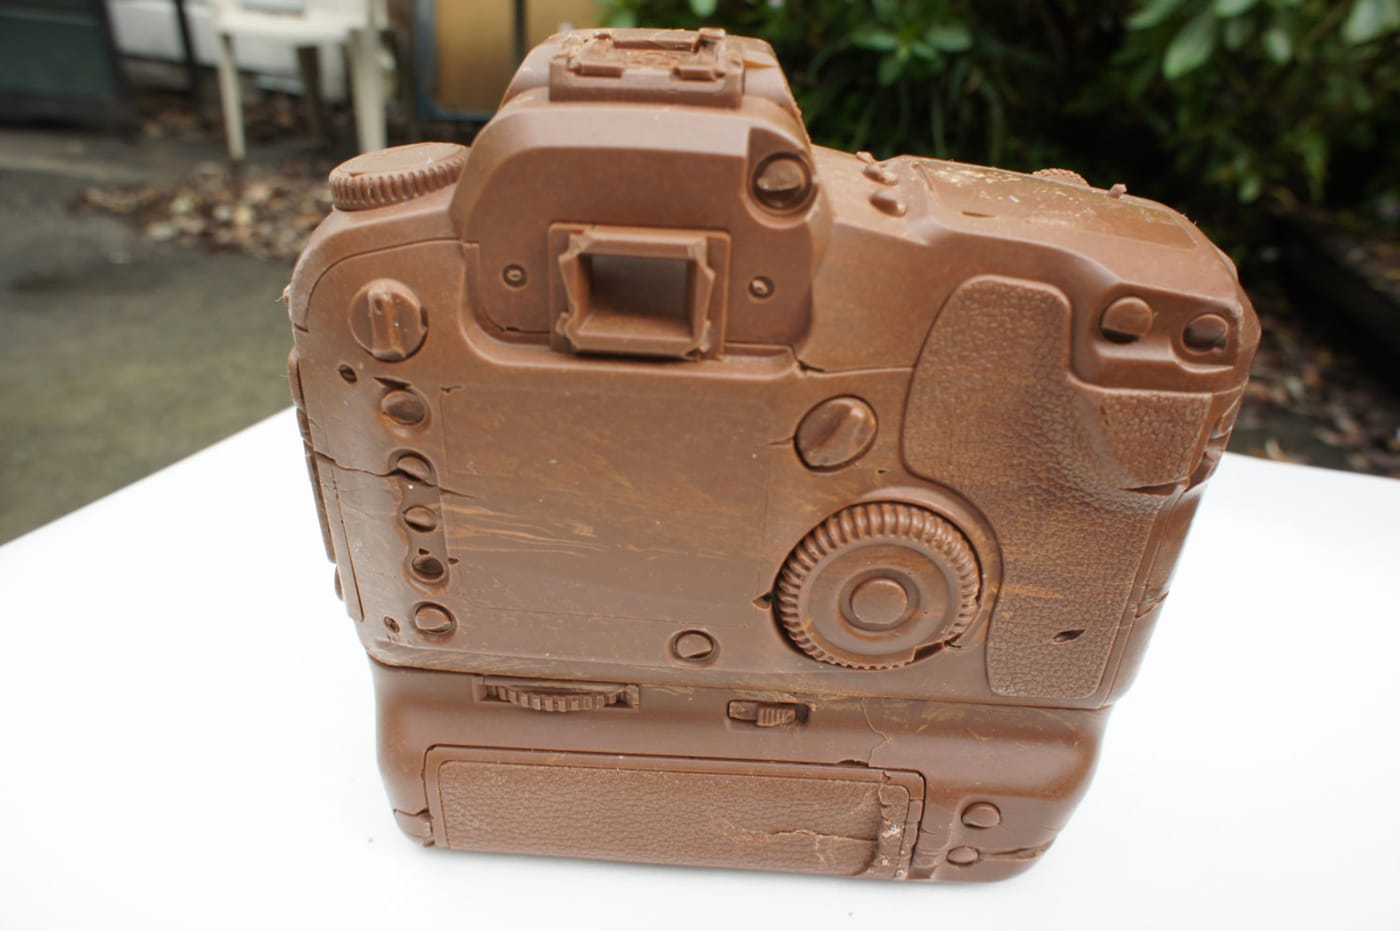 chocolate-canon-d60-camera